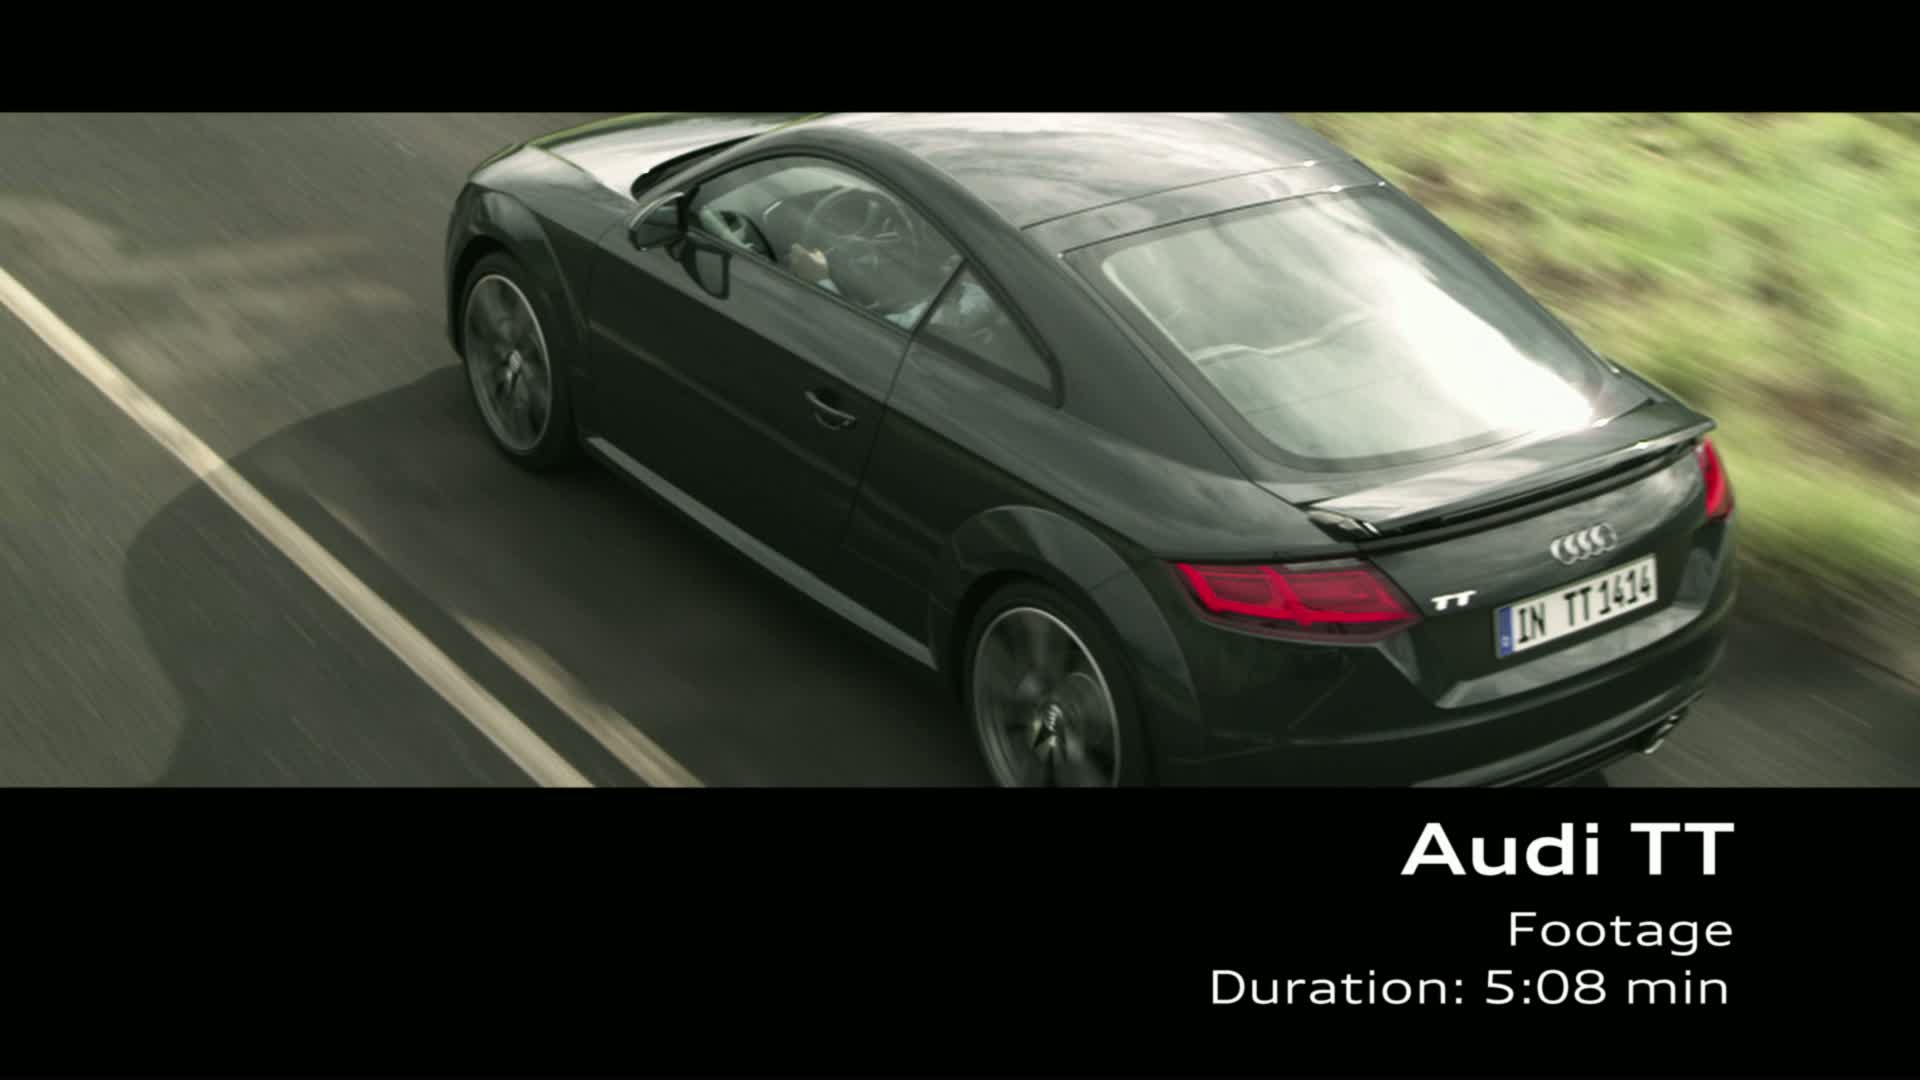 The Audi TT Coupé - Footage